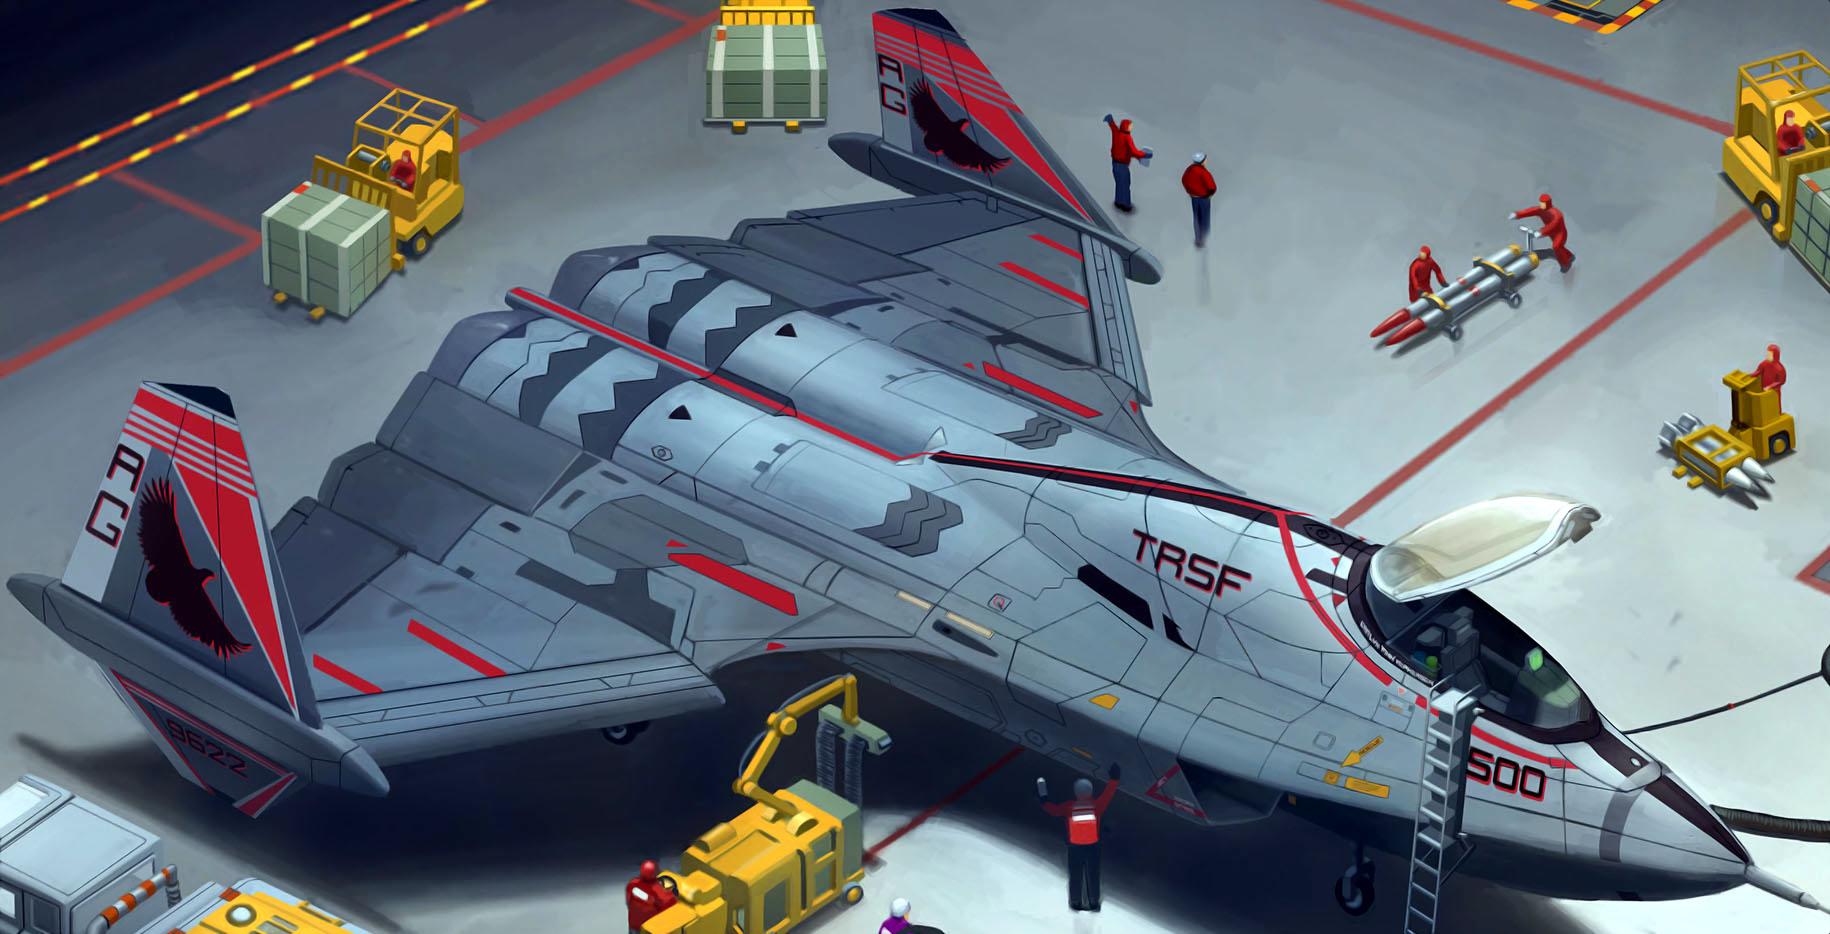 trsf_interceptor_fighter.jpg